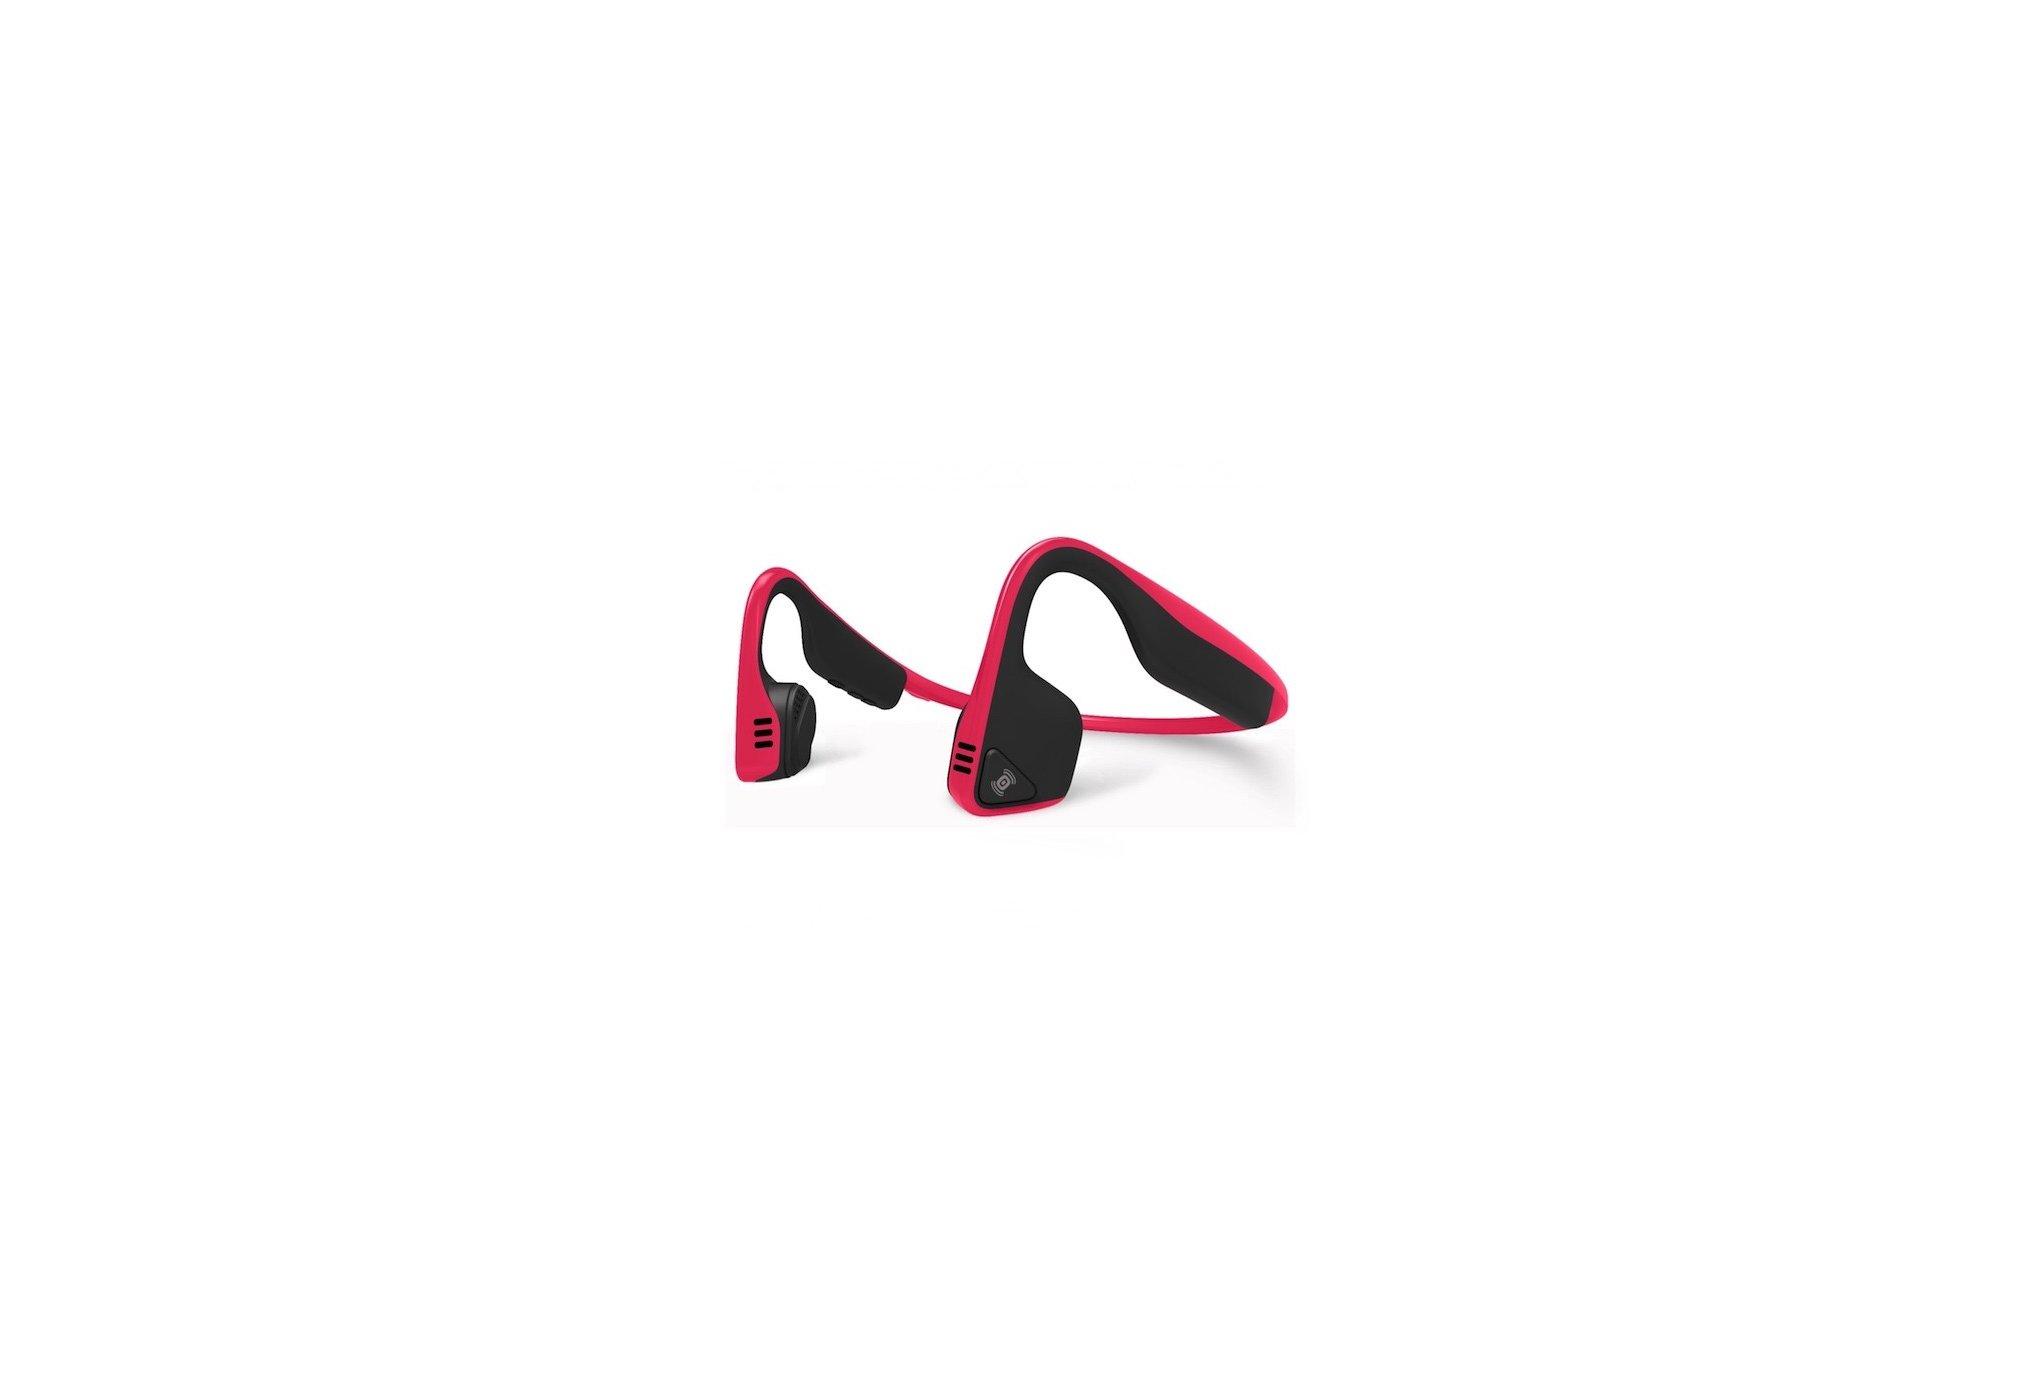 Aftershokz Auriculares Trekz Titanium Bluetooth 4.1 Casques / lecteurs mp3